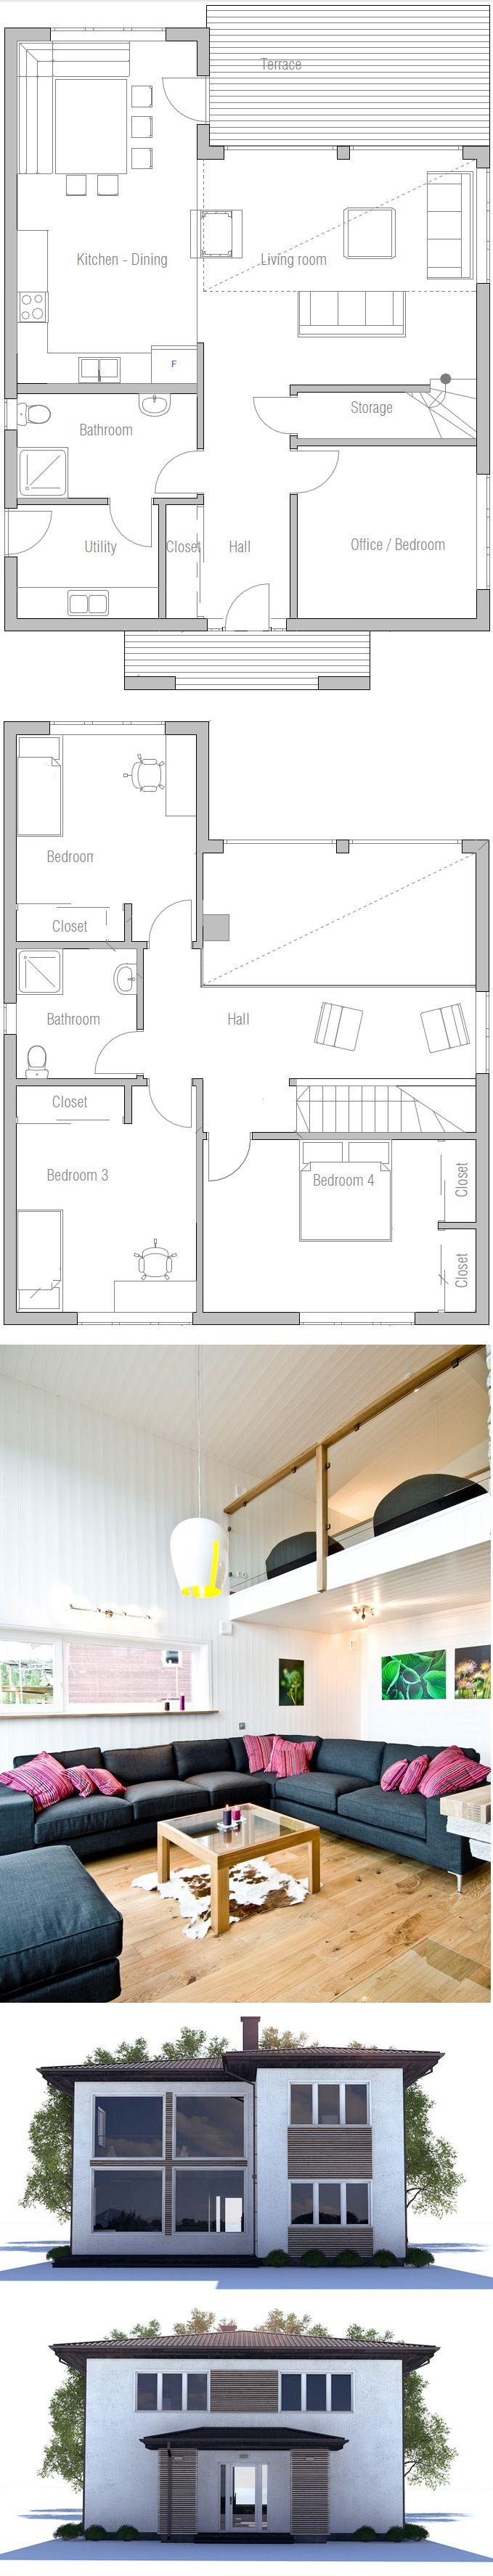 Architecture House Floor Plans 398 best floor plans images on pinterest | home plans, small